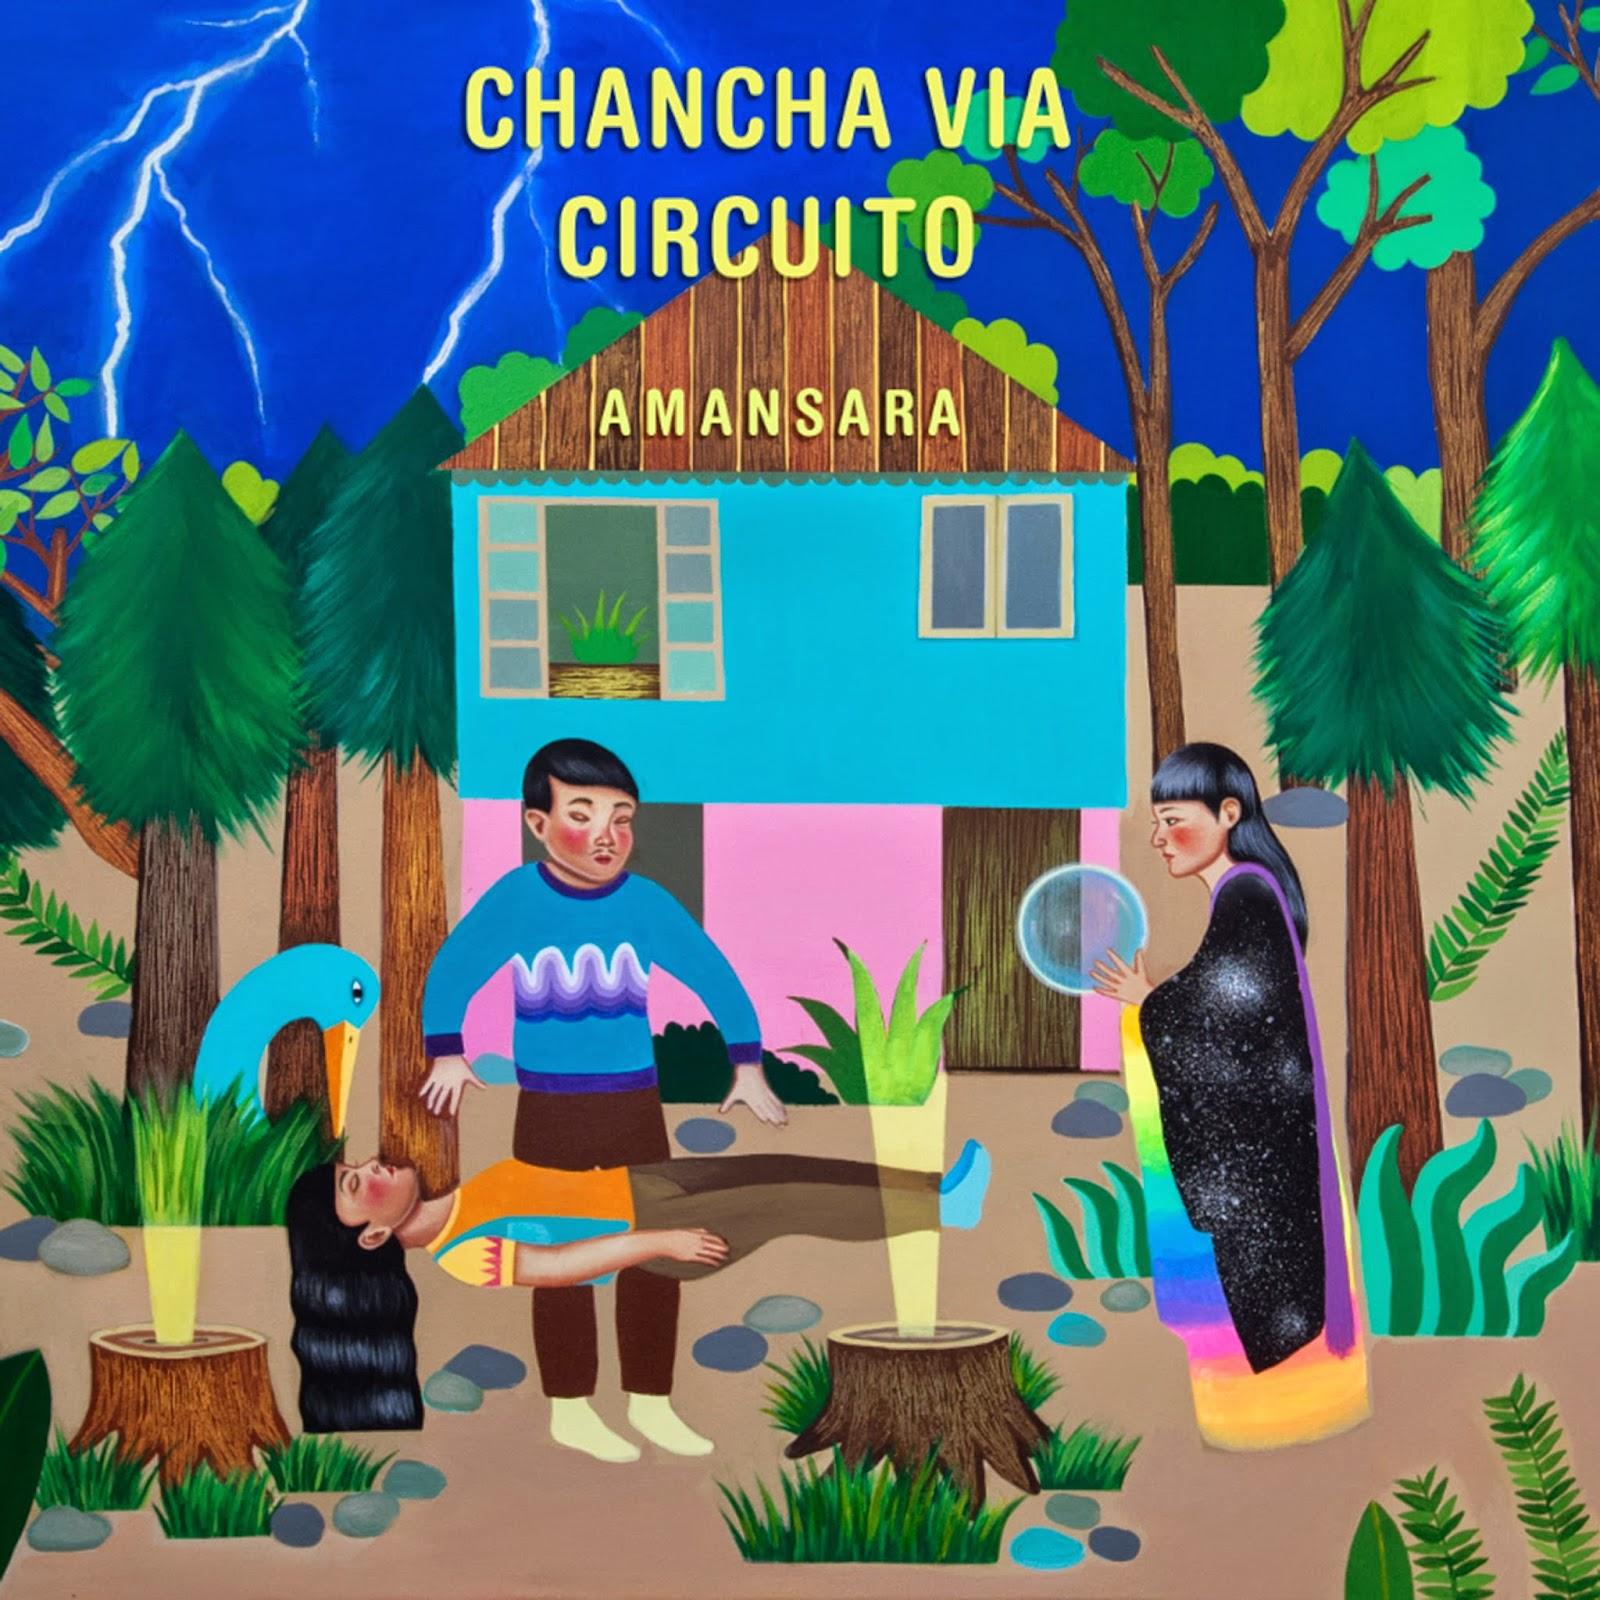 CHANCHA VIA CIRCUITO, Ahora Nosotros, Mixtape, Test Pressing, Album,  Amansara, Review